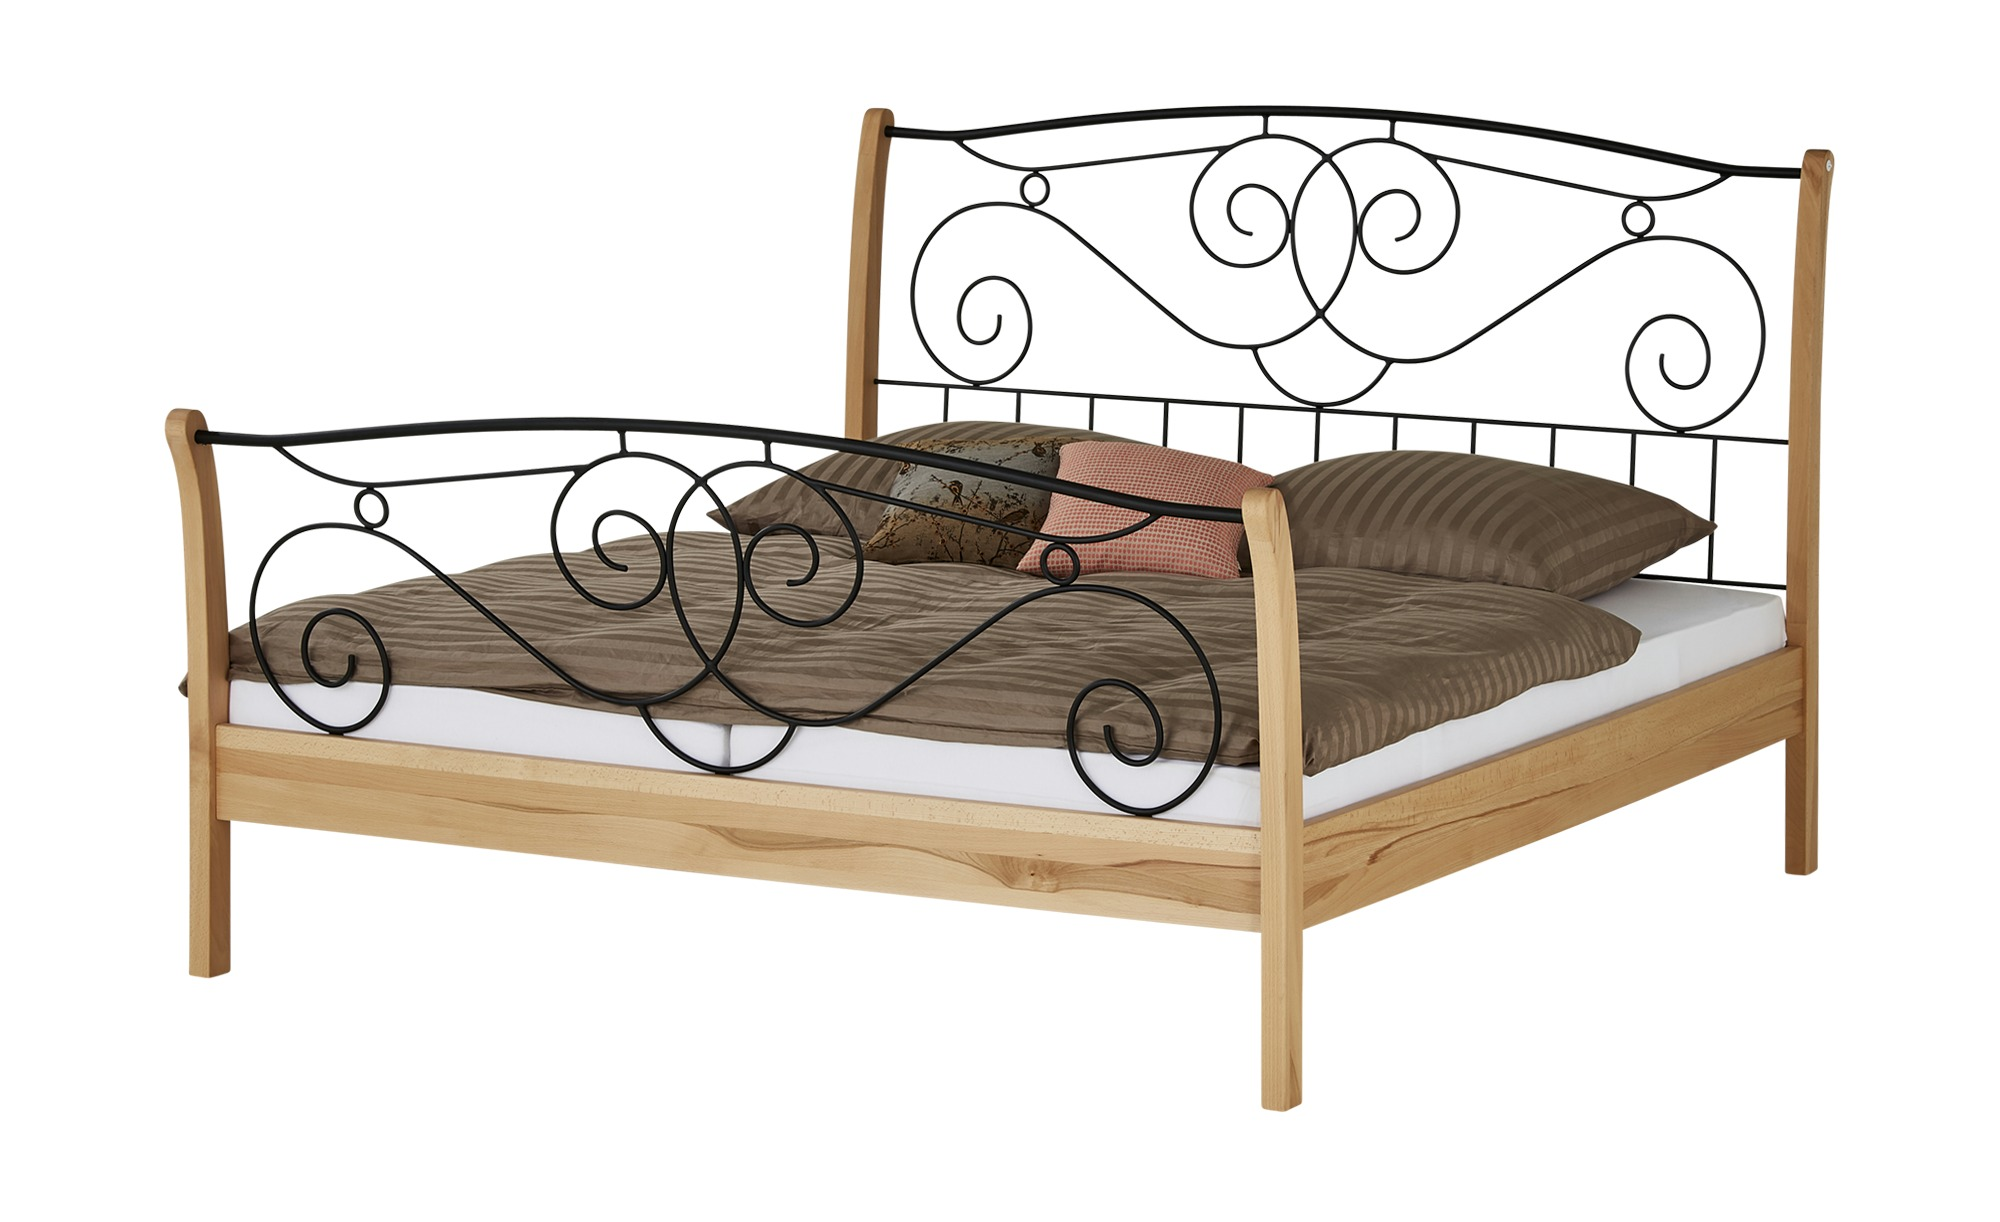 Holzfarben Holz Metall Futonbetten Online Kaufen Mobel